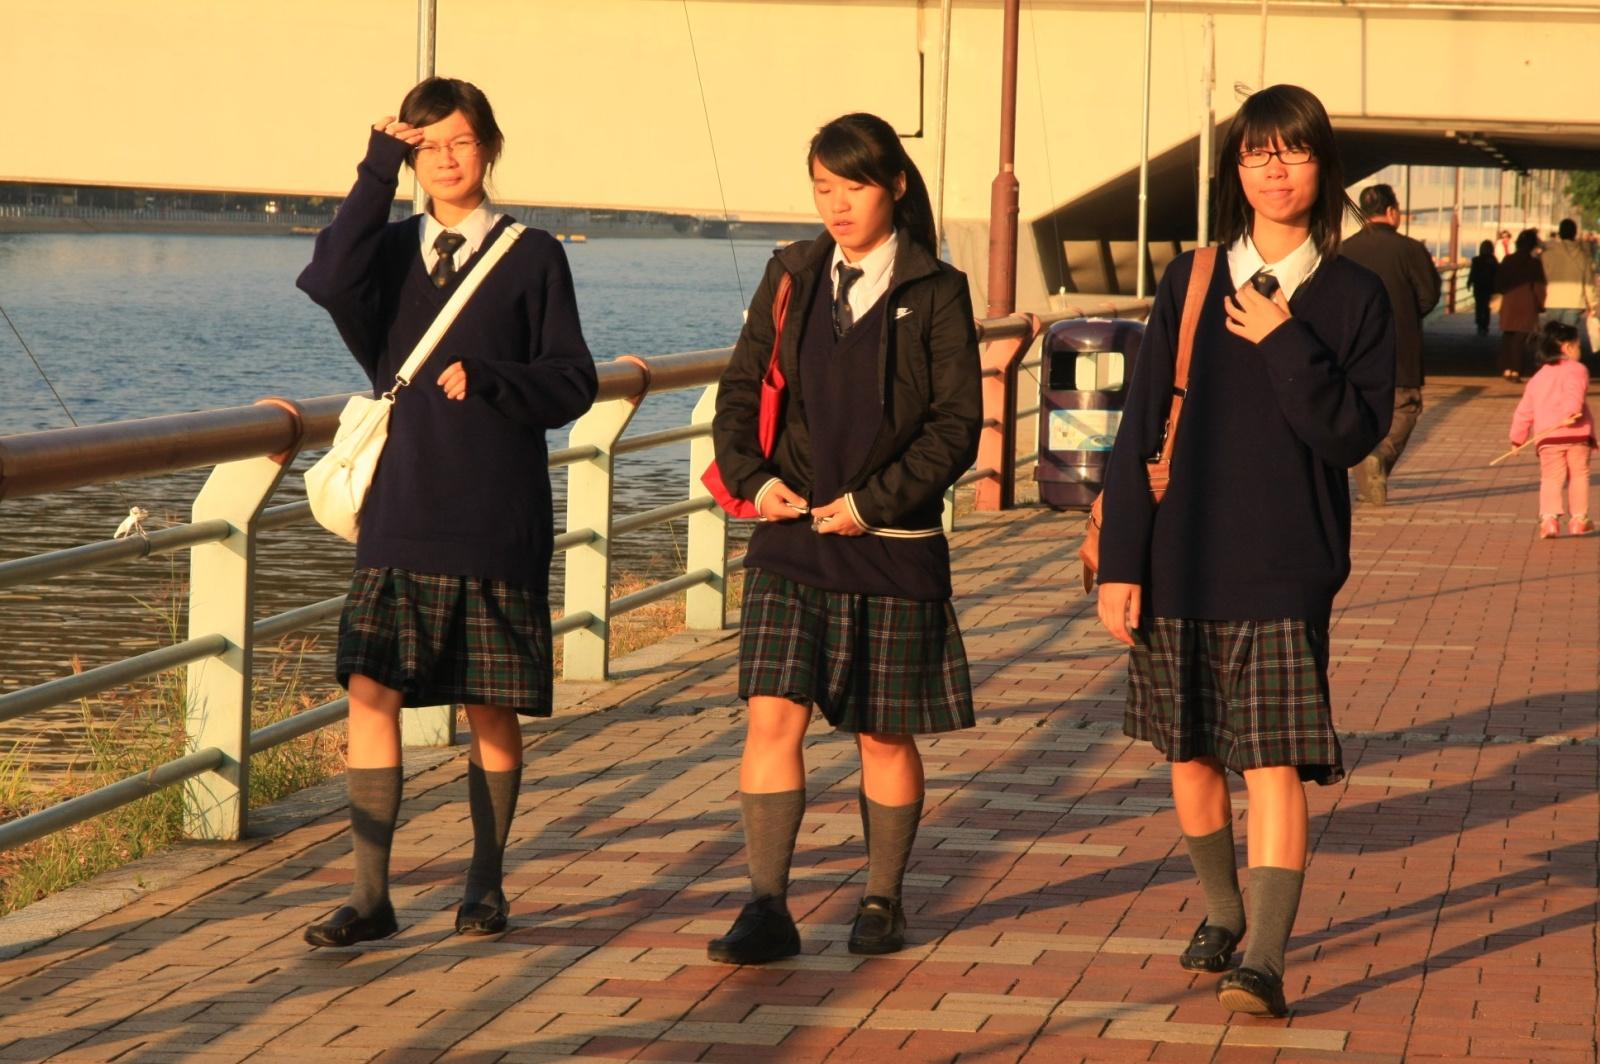 Chinese schoolgirls seem to have some Scottish influence